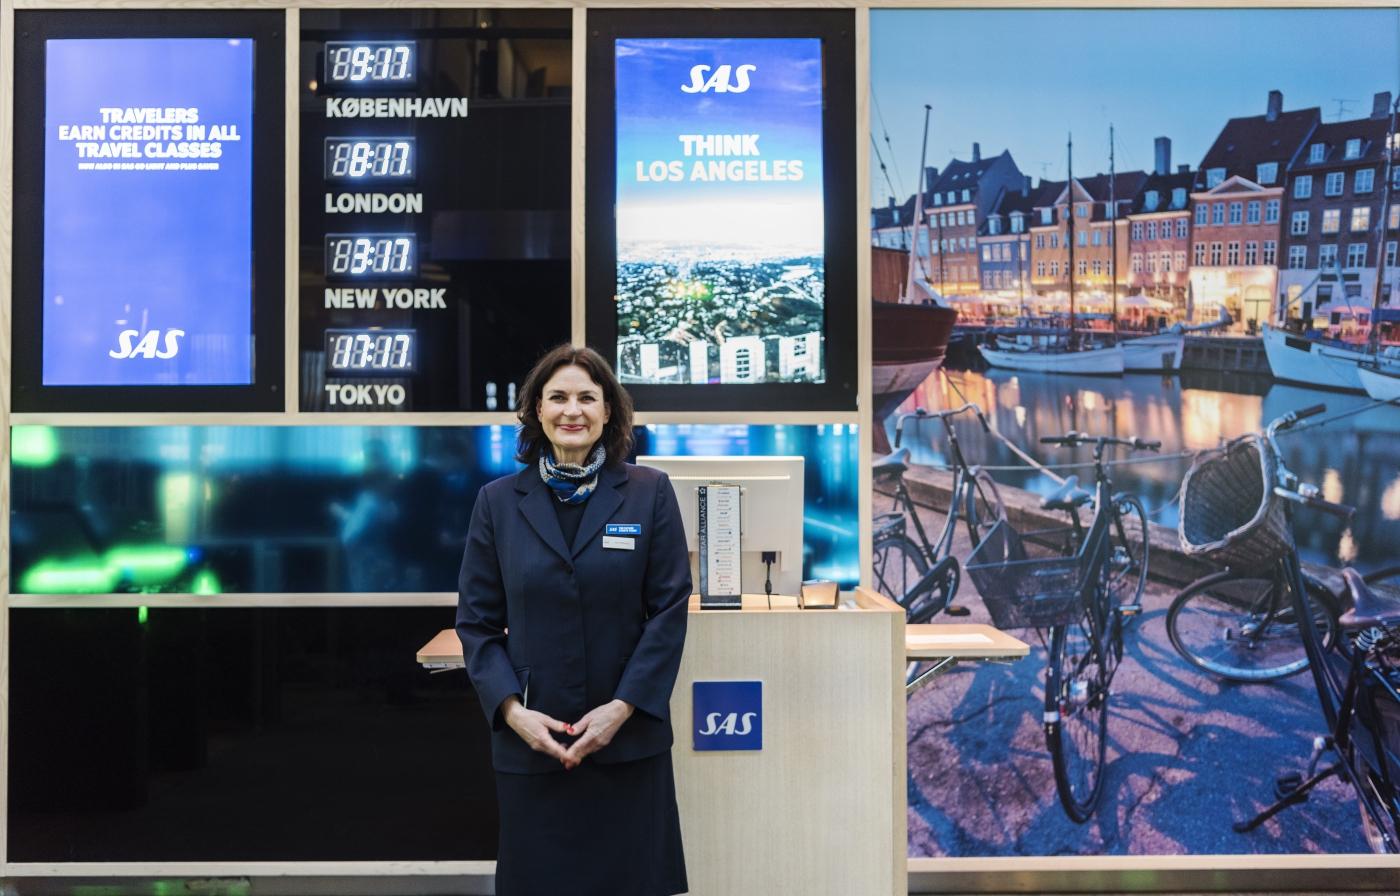 SAS-ansat byder velkommen til loungen. (Foto: SAS AB | PR)